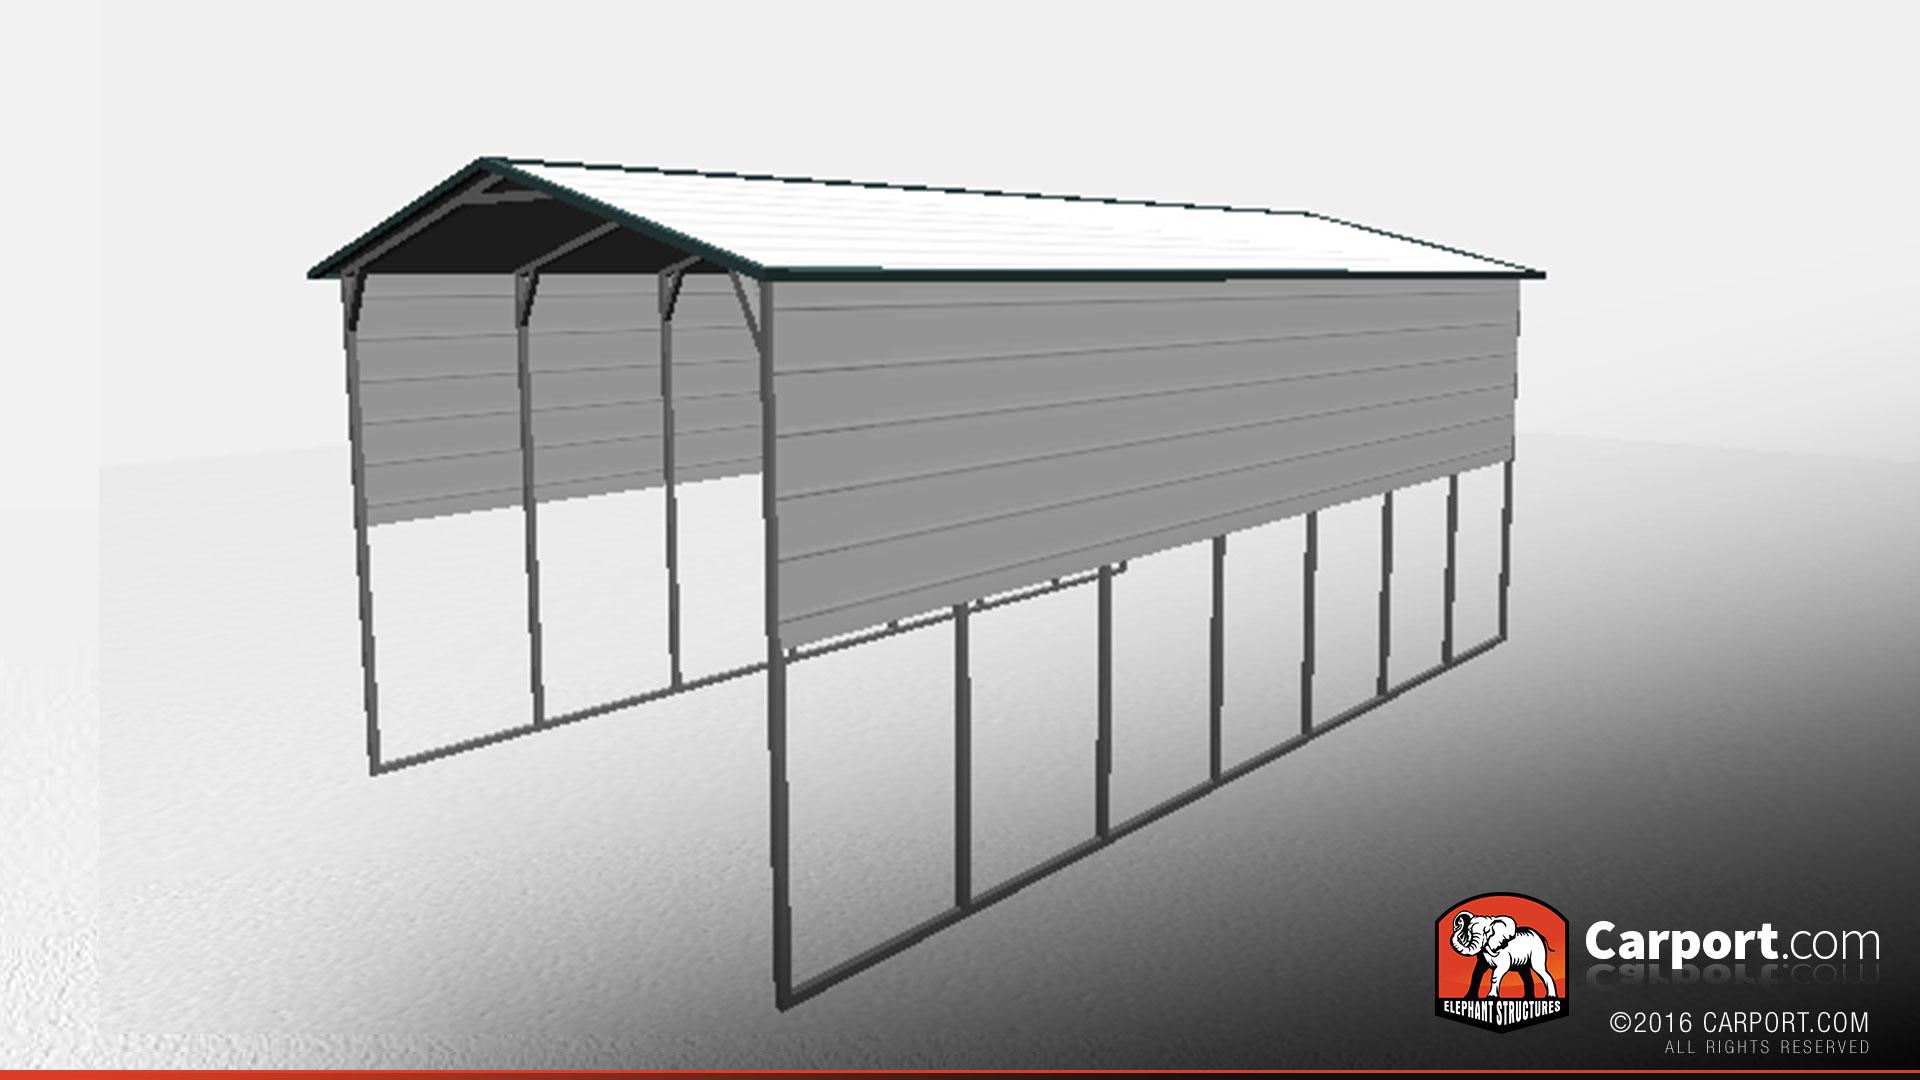 16' x 30' x 12' RV Carport with Extra Panels   Shop Metal ...